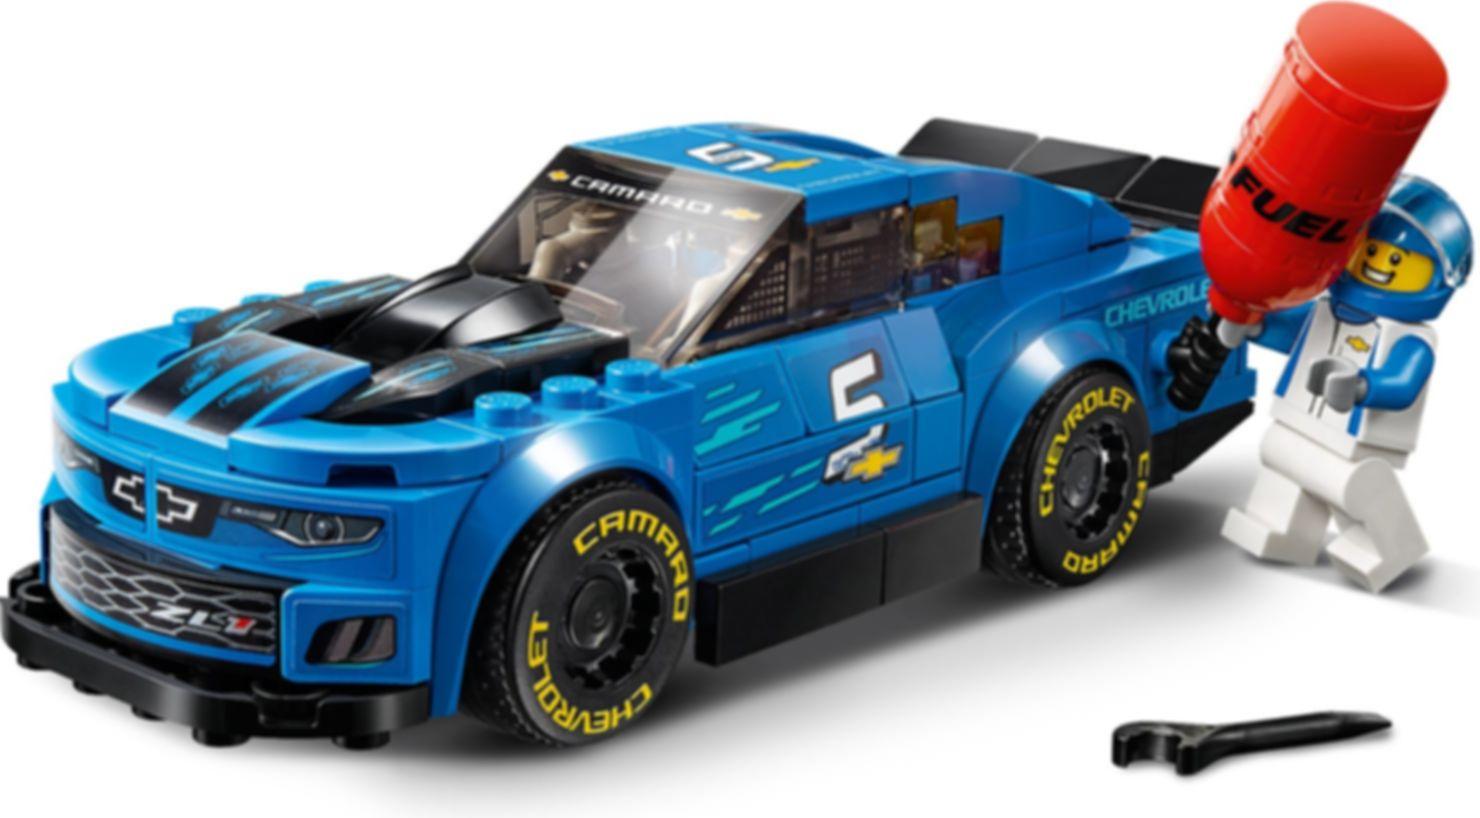 Chevrolet Camaro ZL1 Race Car gameplay